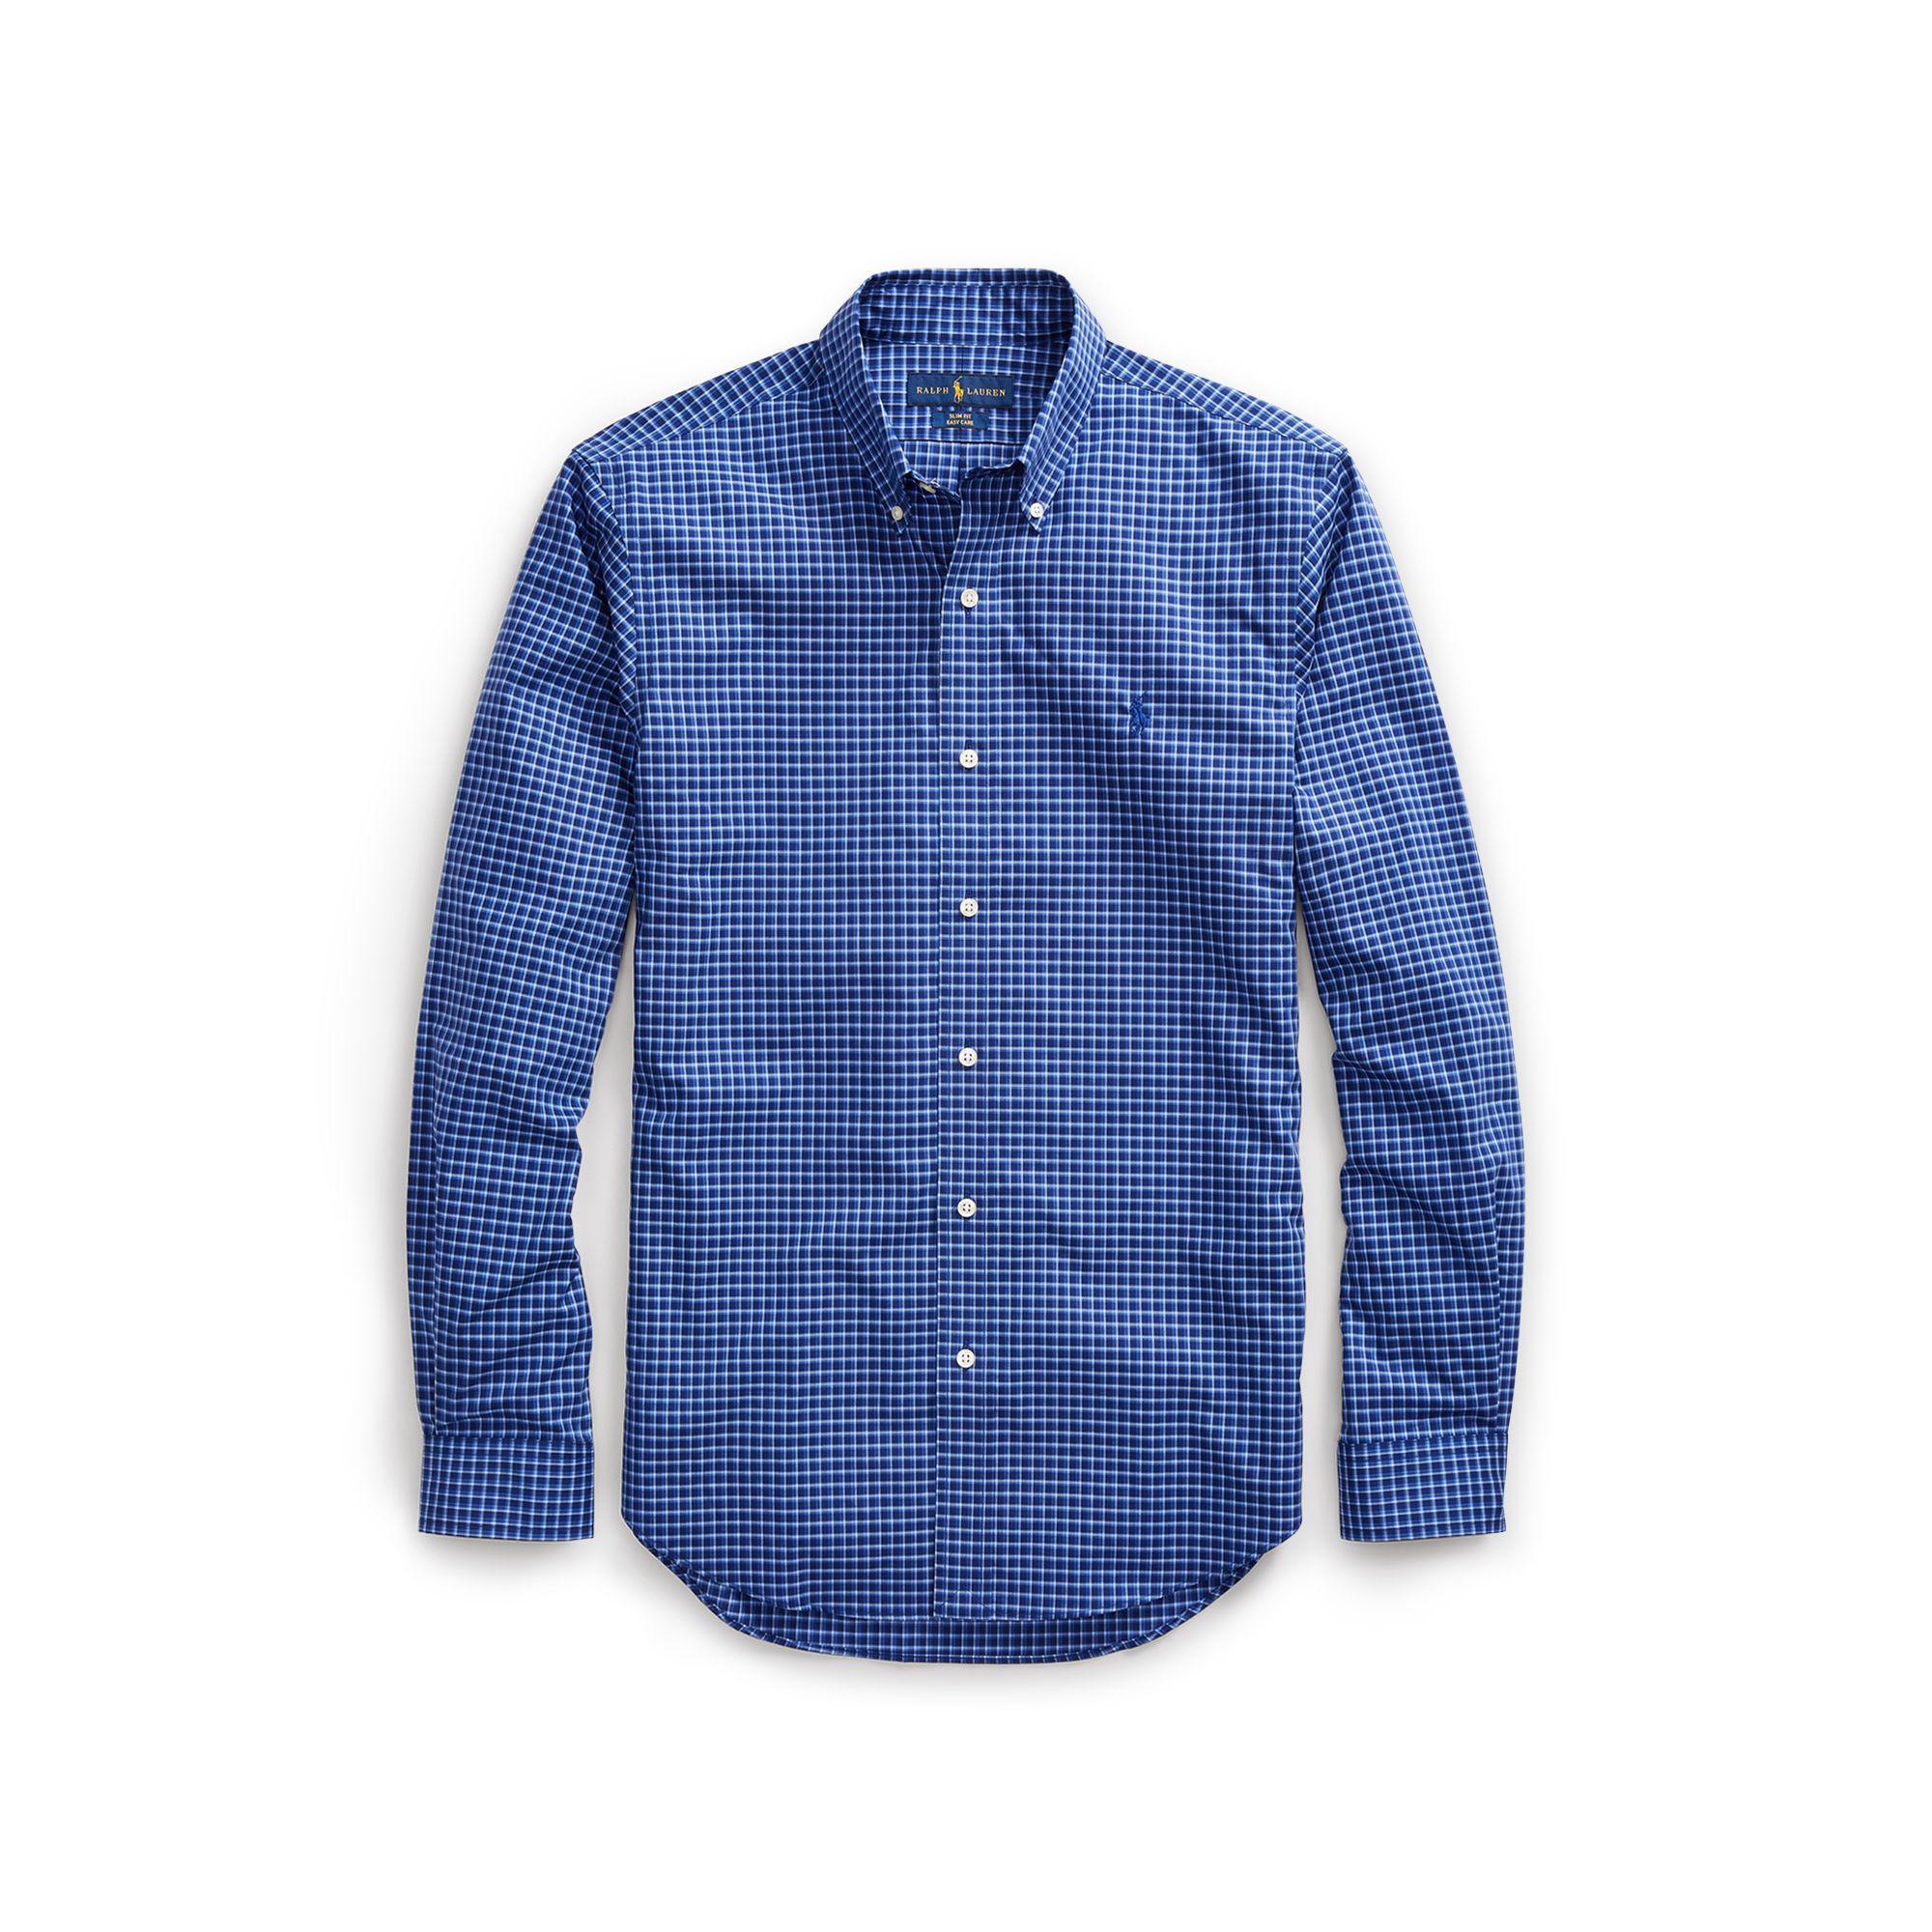 Polo Ralph Lauren Slim Fit No Iron Cotton Shirt In Blue For Men Lyst